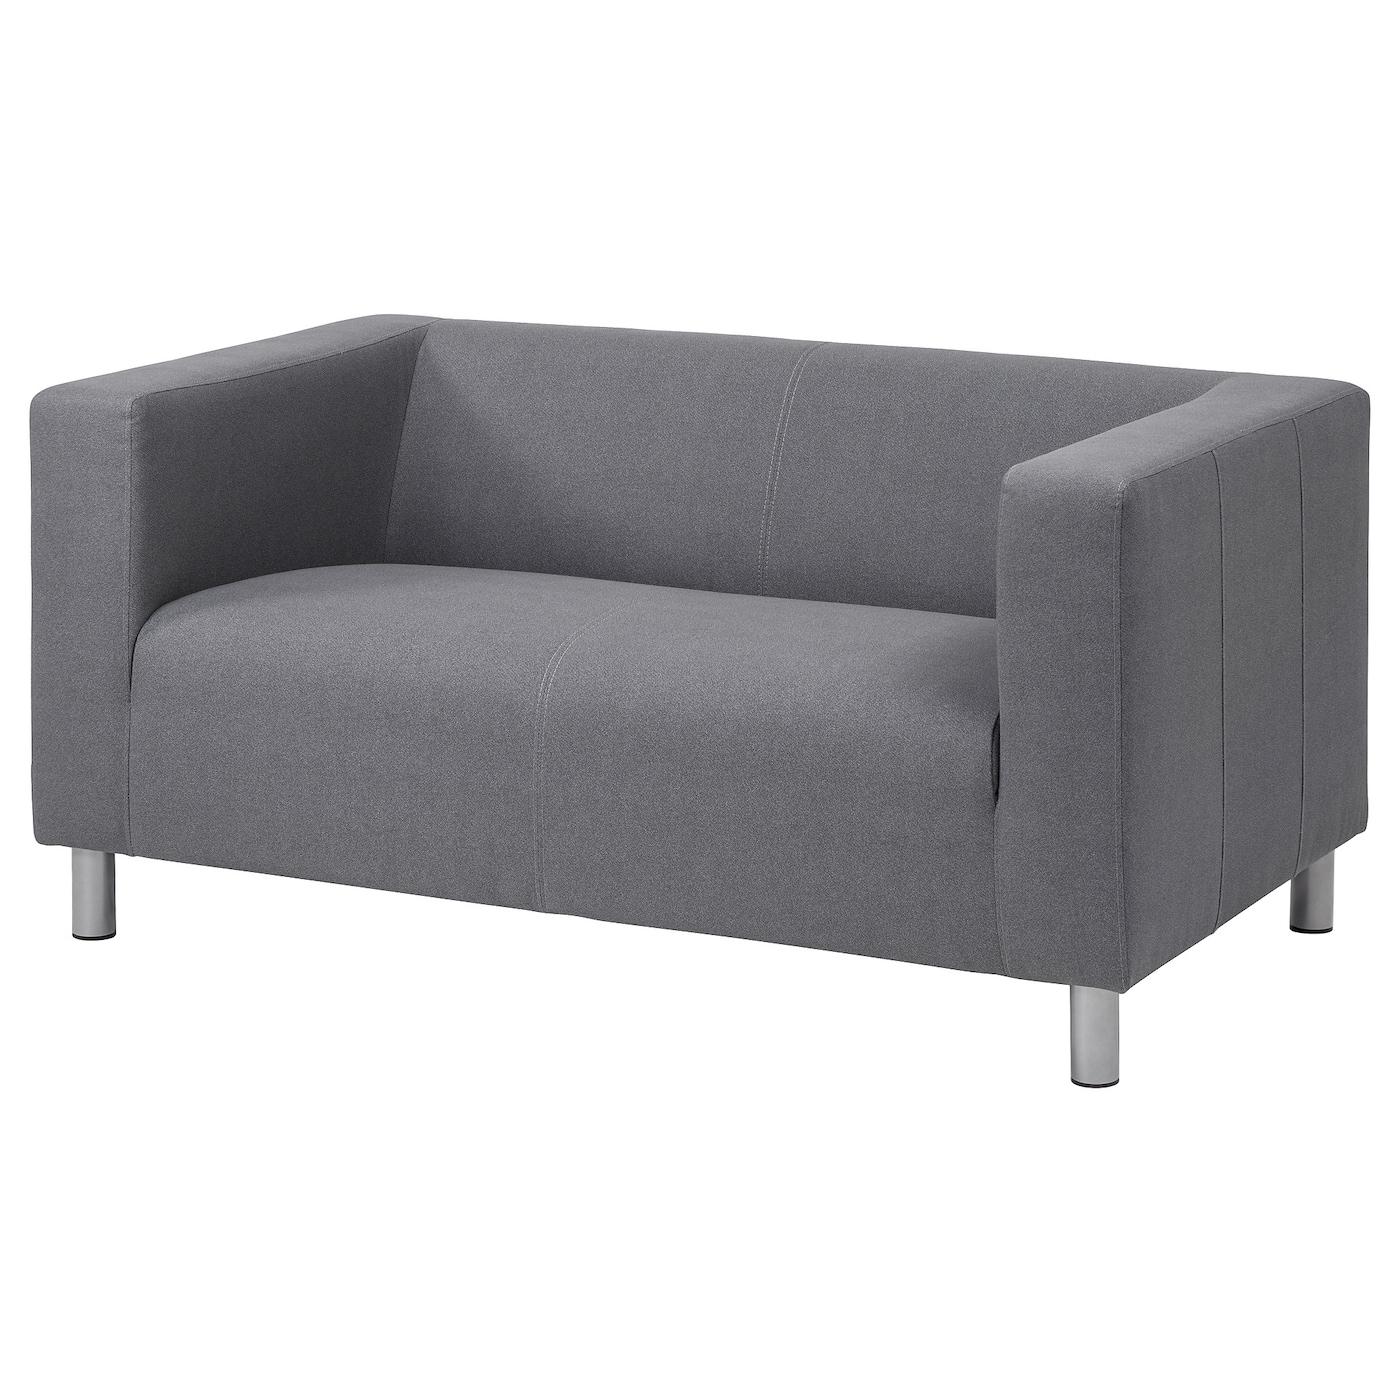 Klippan Flackarp Grey Compact 2 Seat